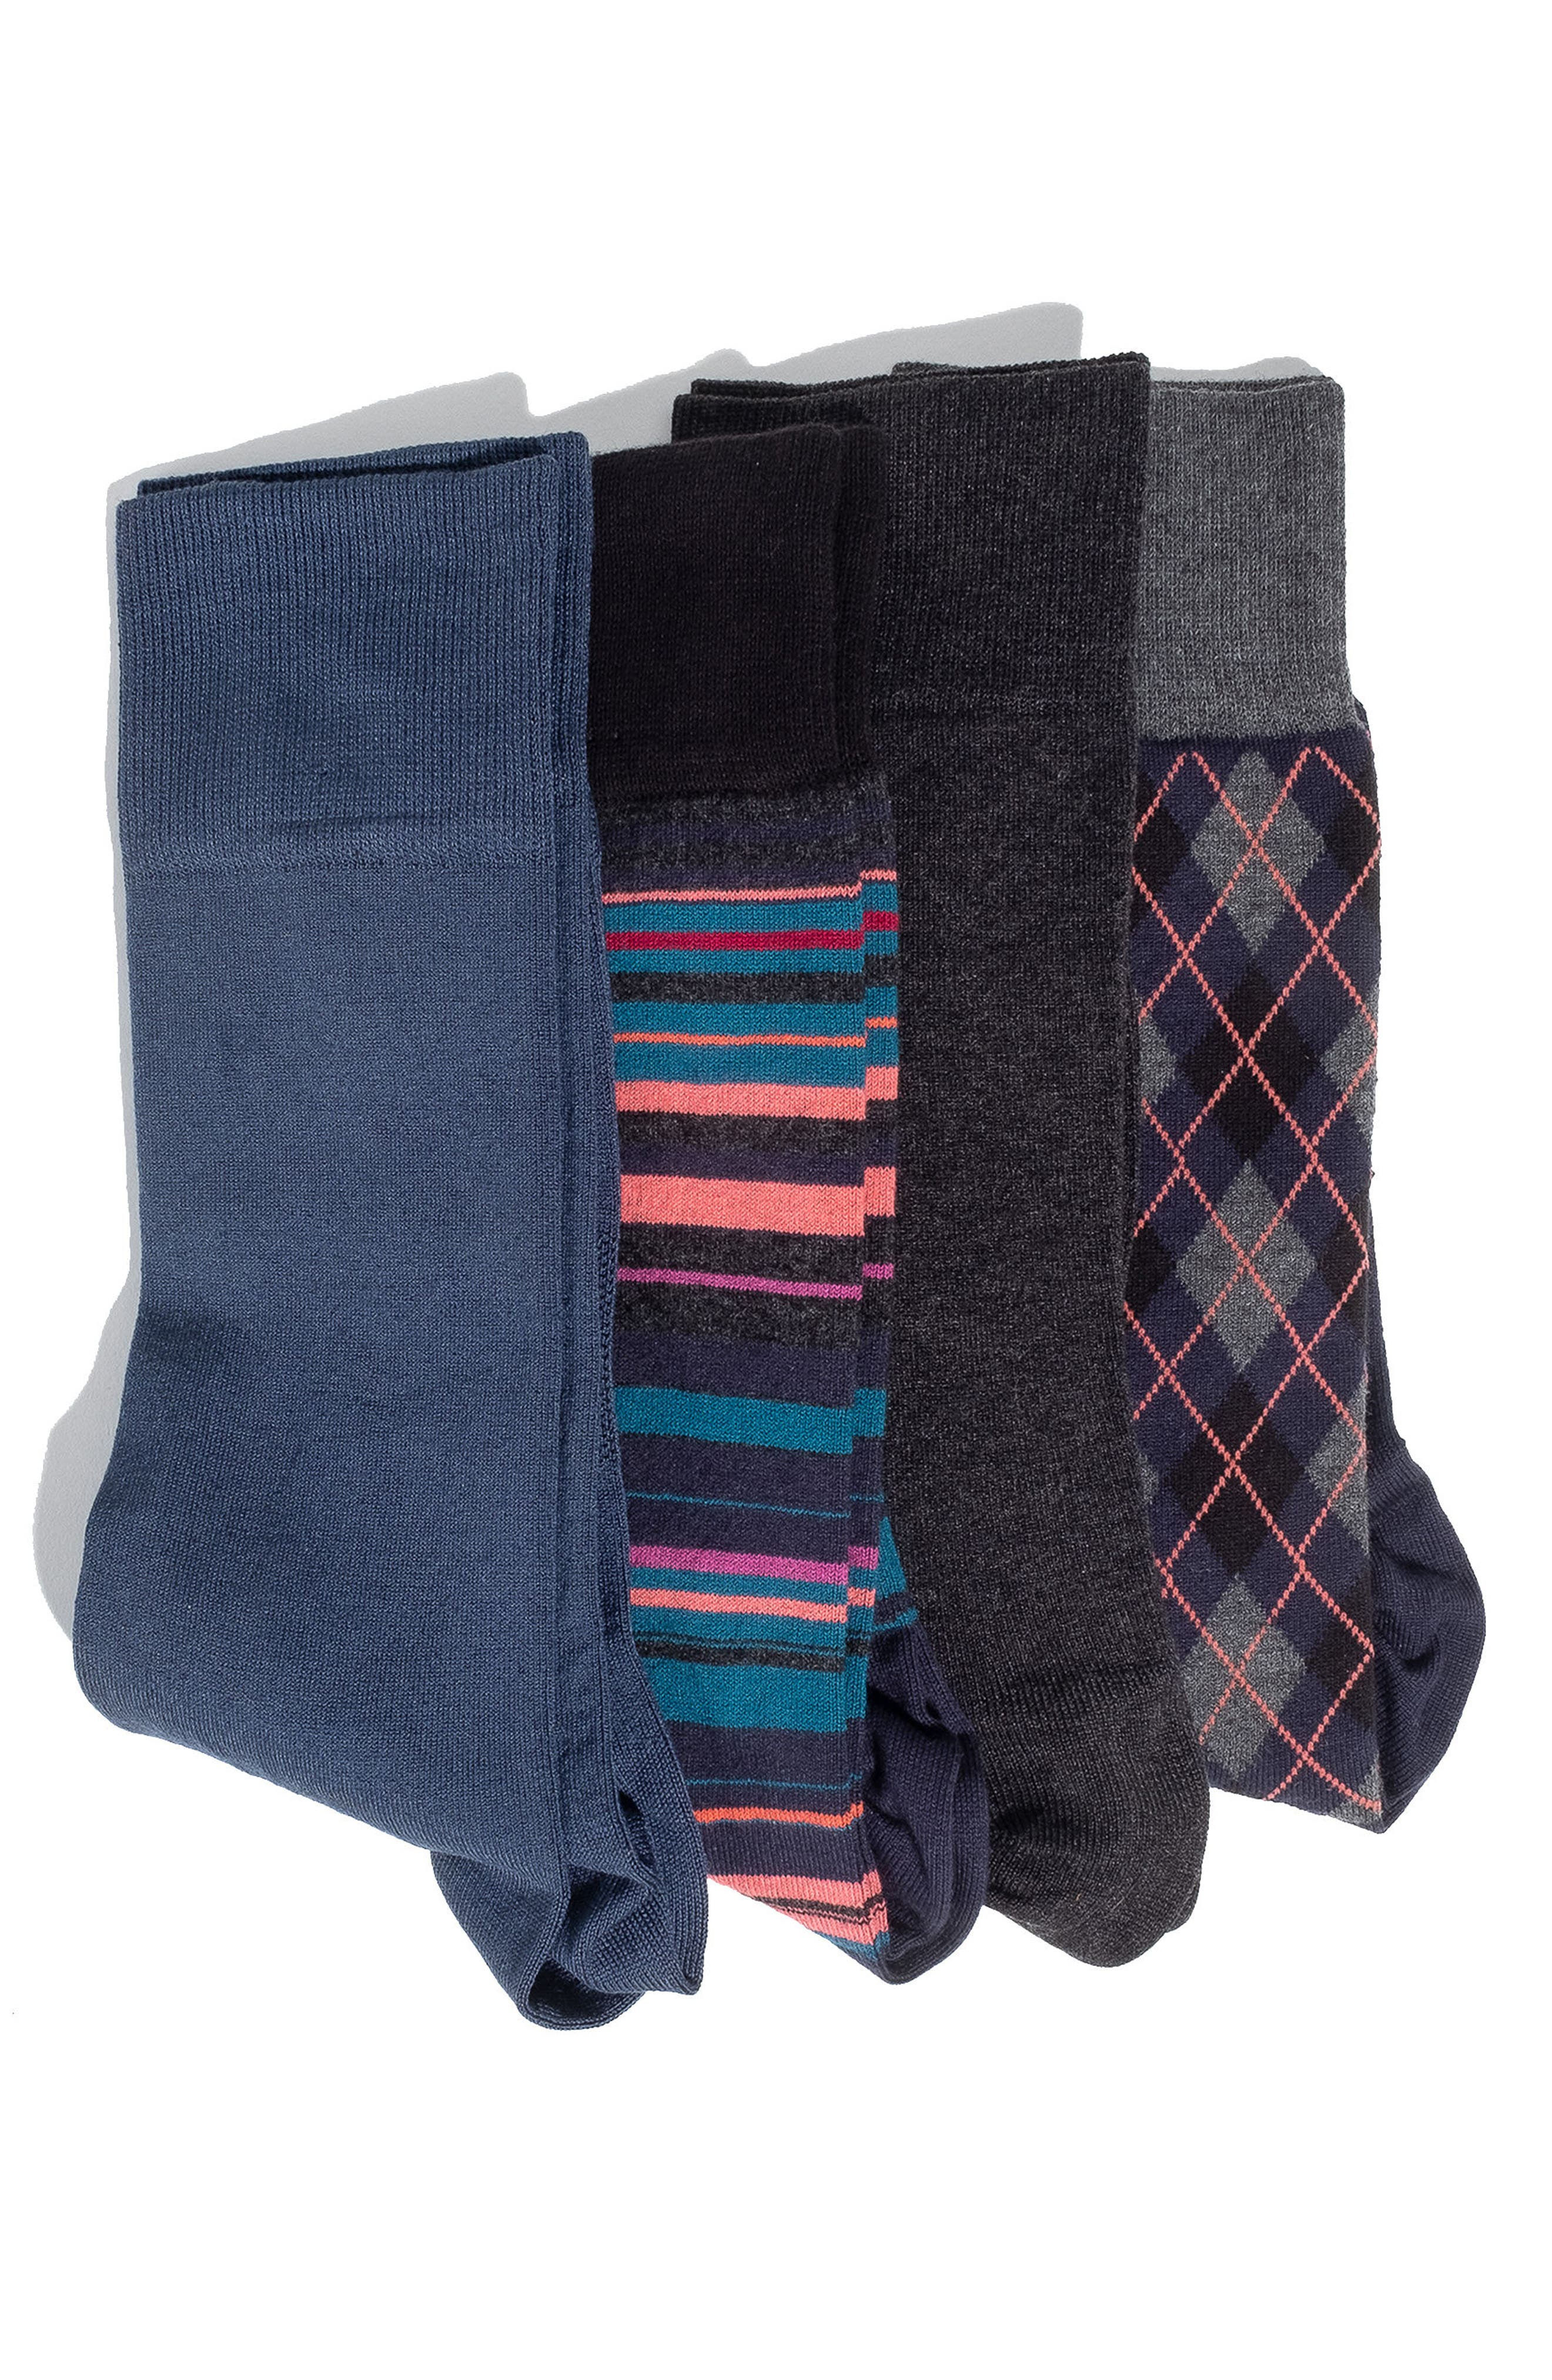 4-Pack Socks,                         Main,                         color, 400